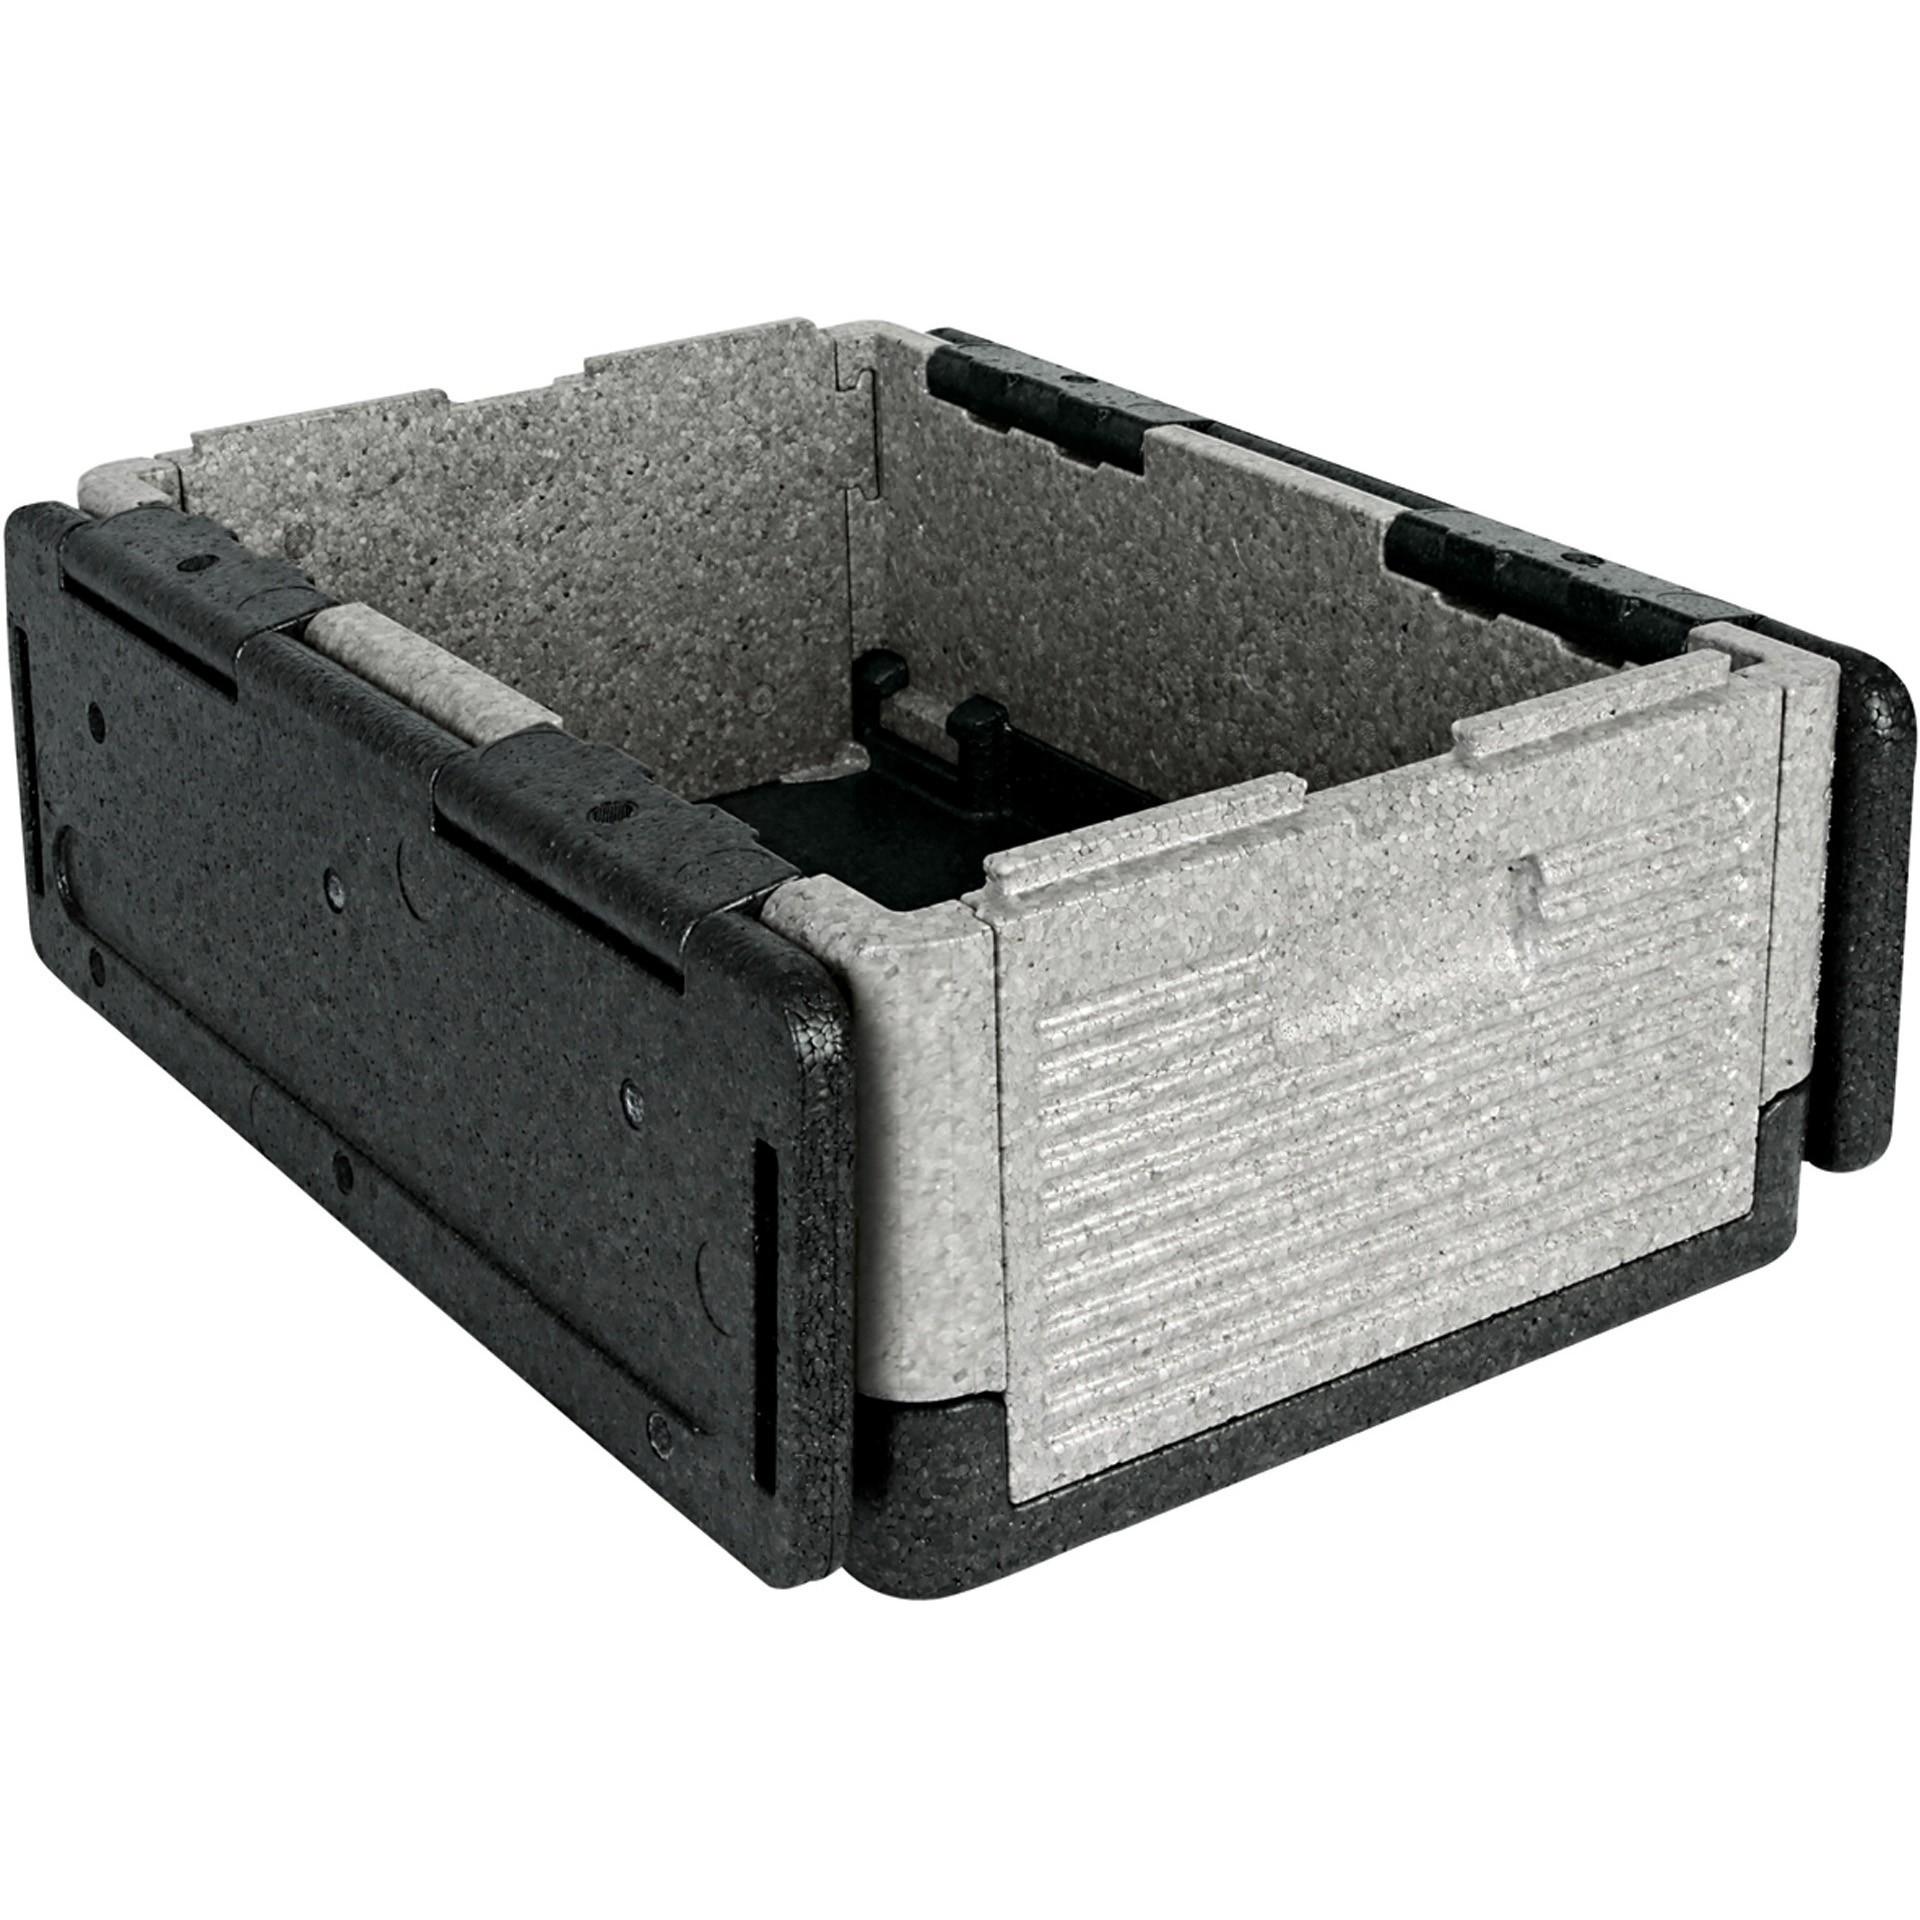 gn thermotransport klappbox stapelbar zusammenklappbar. Black Bedroom Furniture Sets. Home Design Ideas